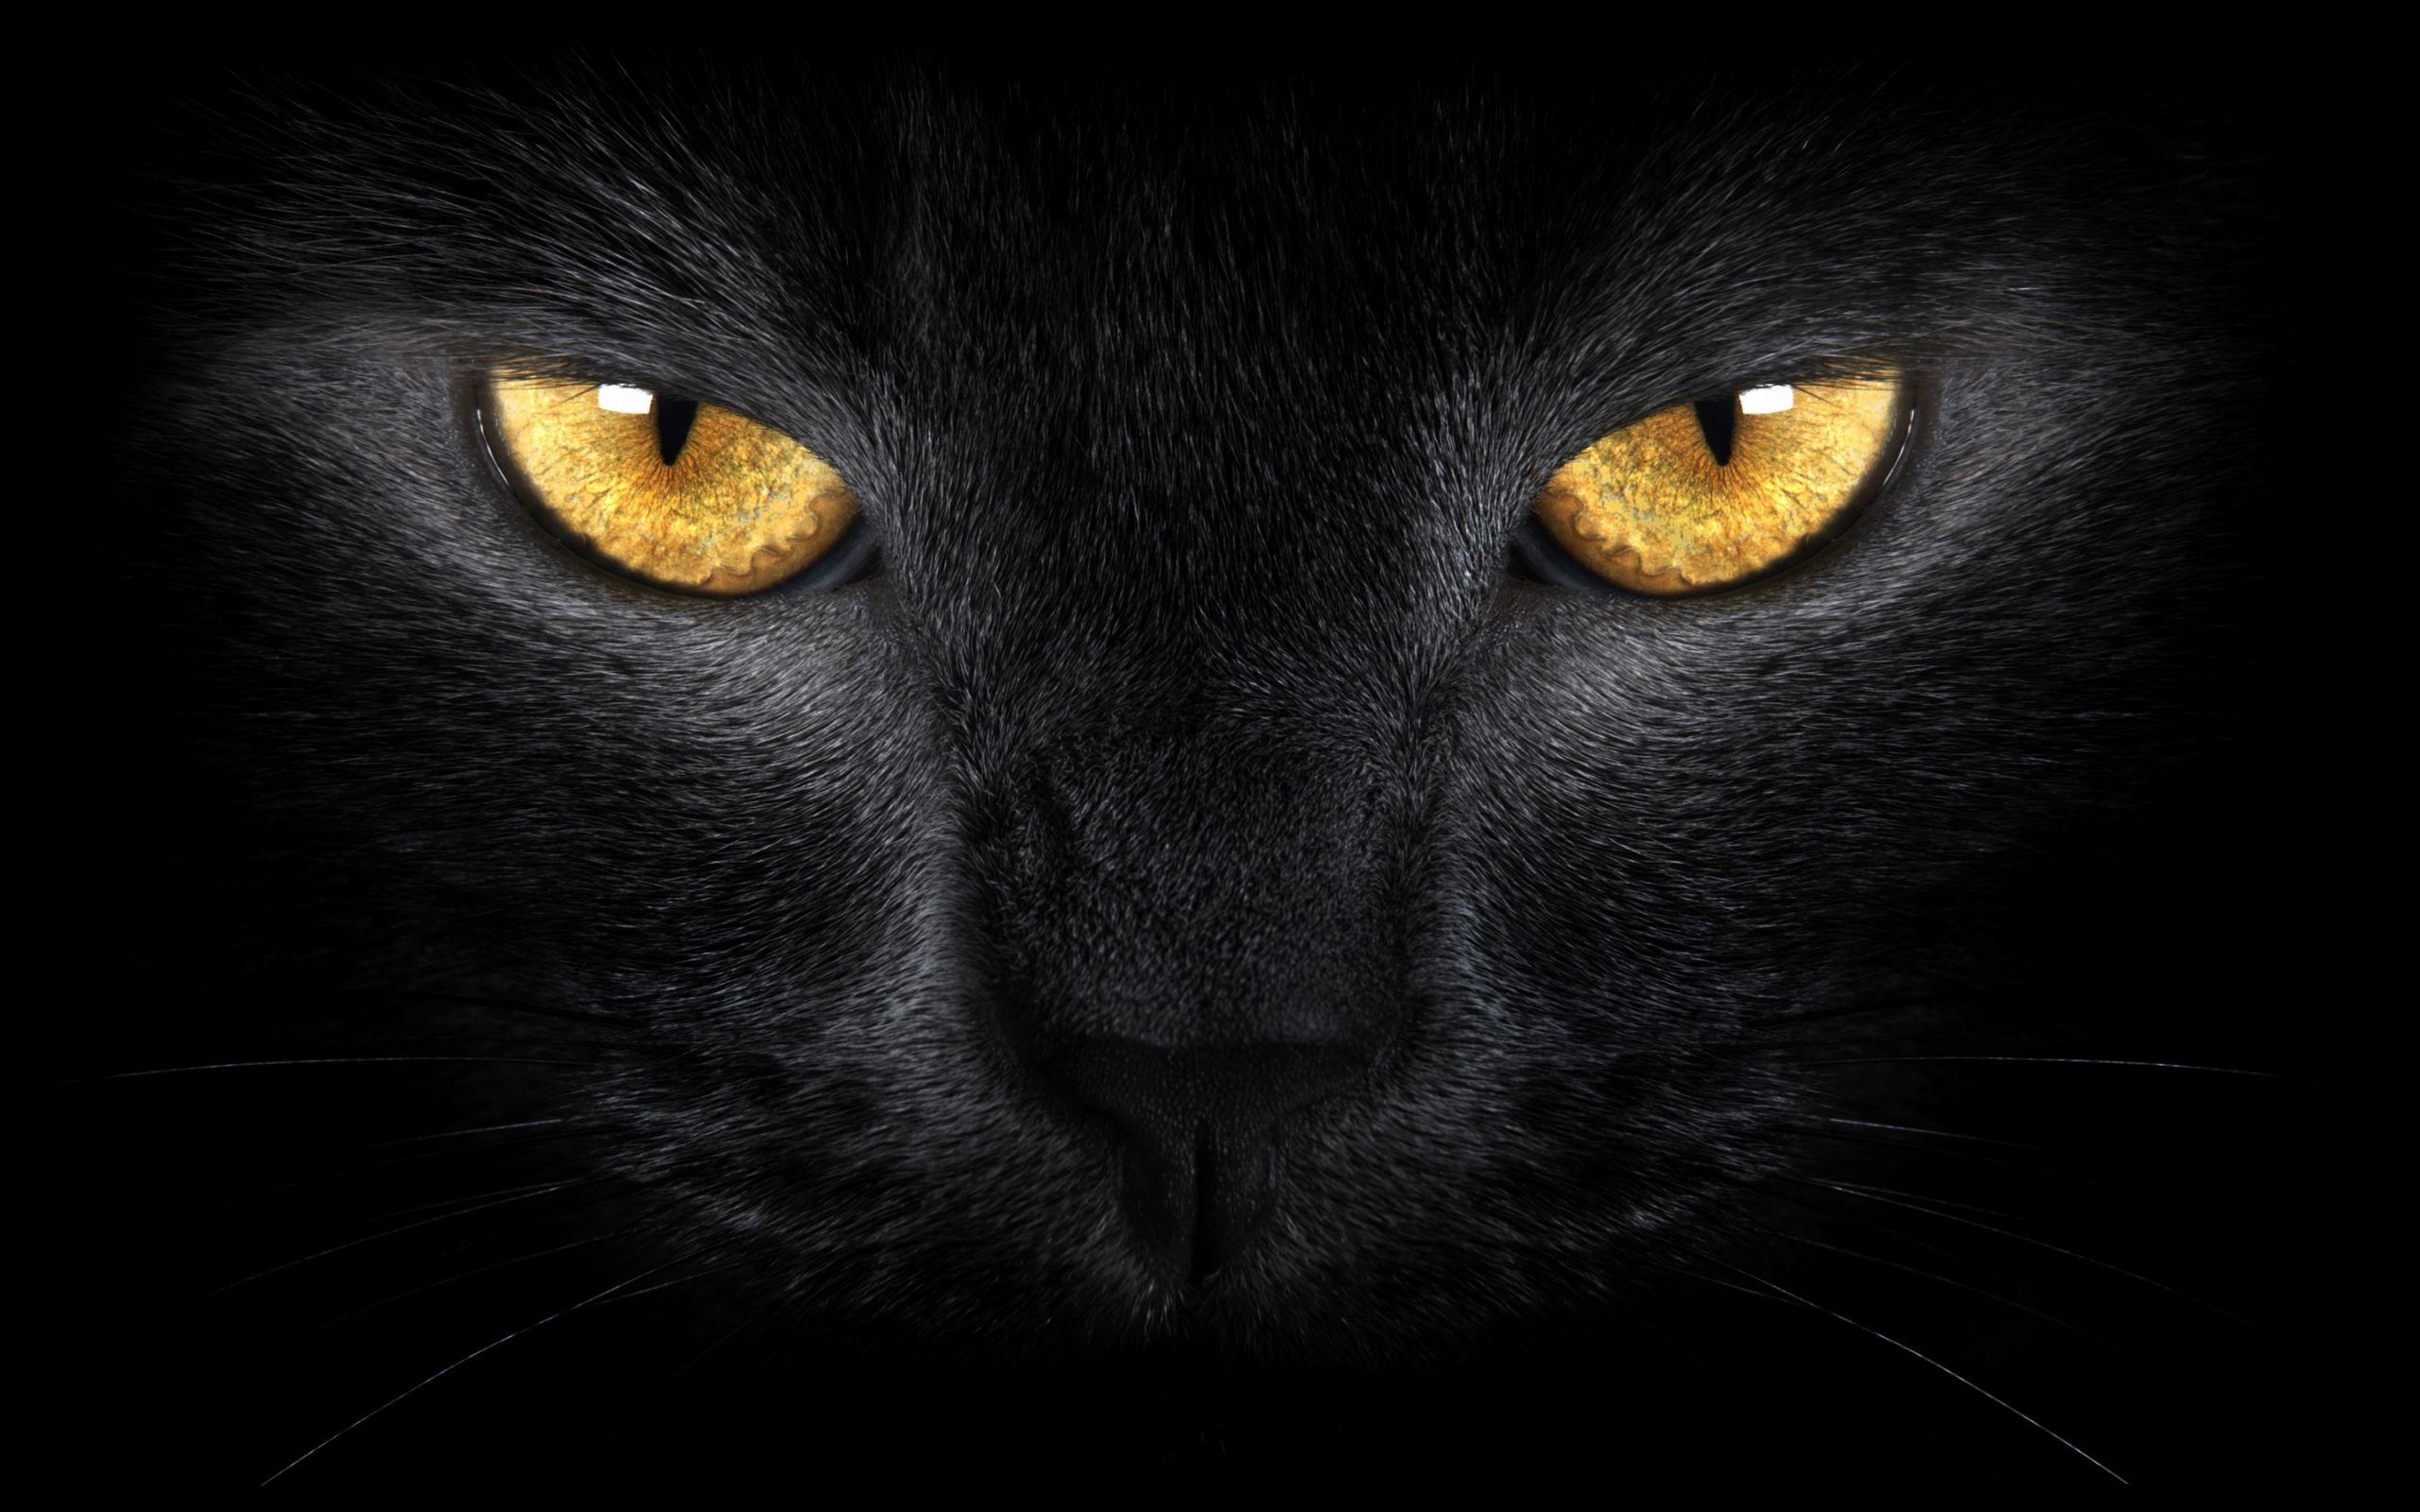 Black Cat Eyes Wallpapers Hd Wallpapers Laptop Wallpapers Eyes Wallpaper Black Cat Eyes Cat Poems